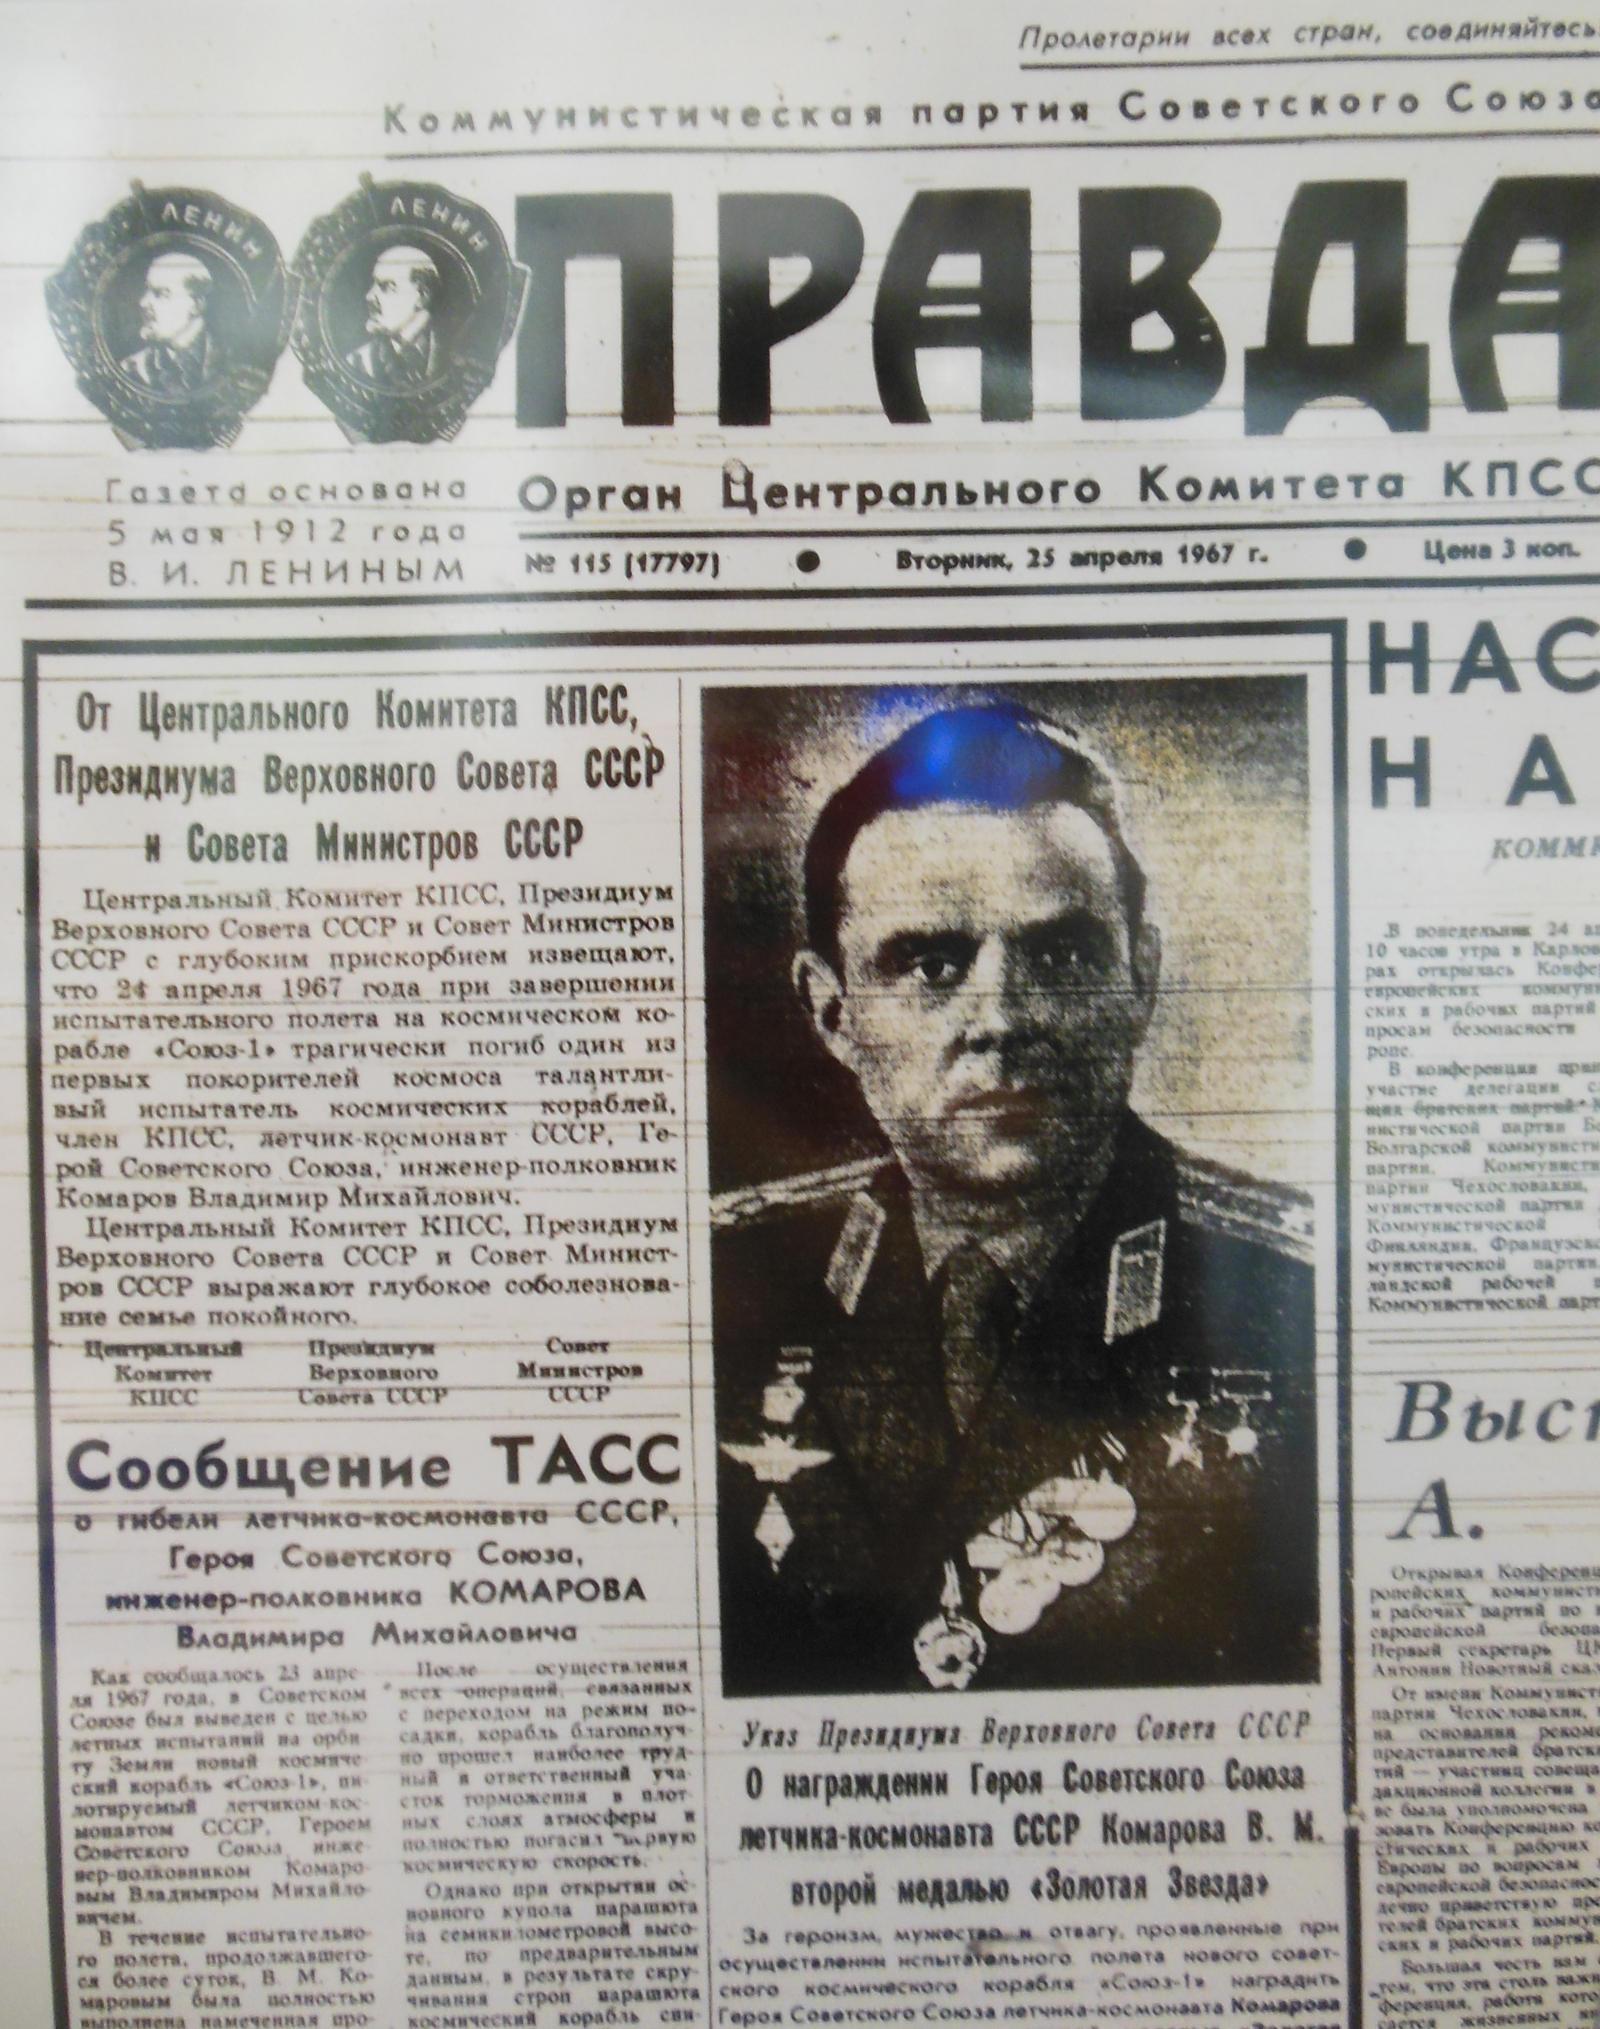 Pravda Announces the Death of Komarov